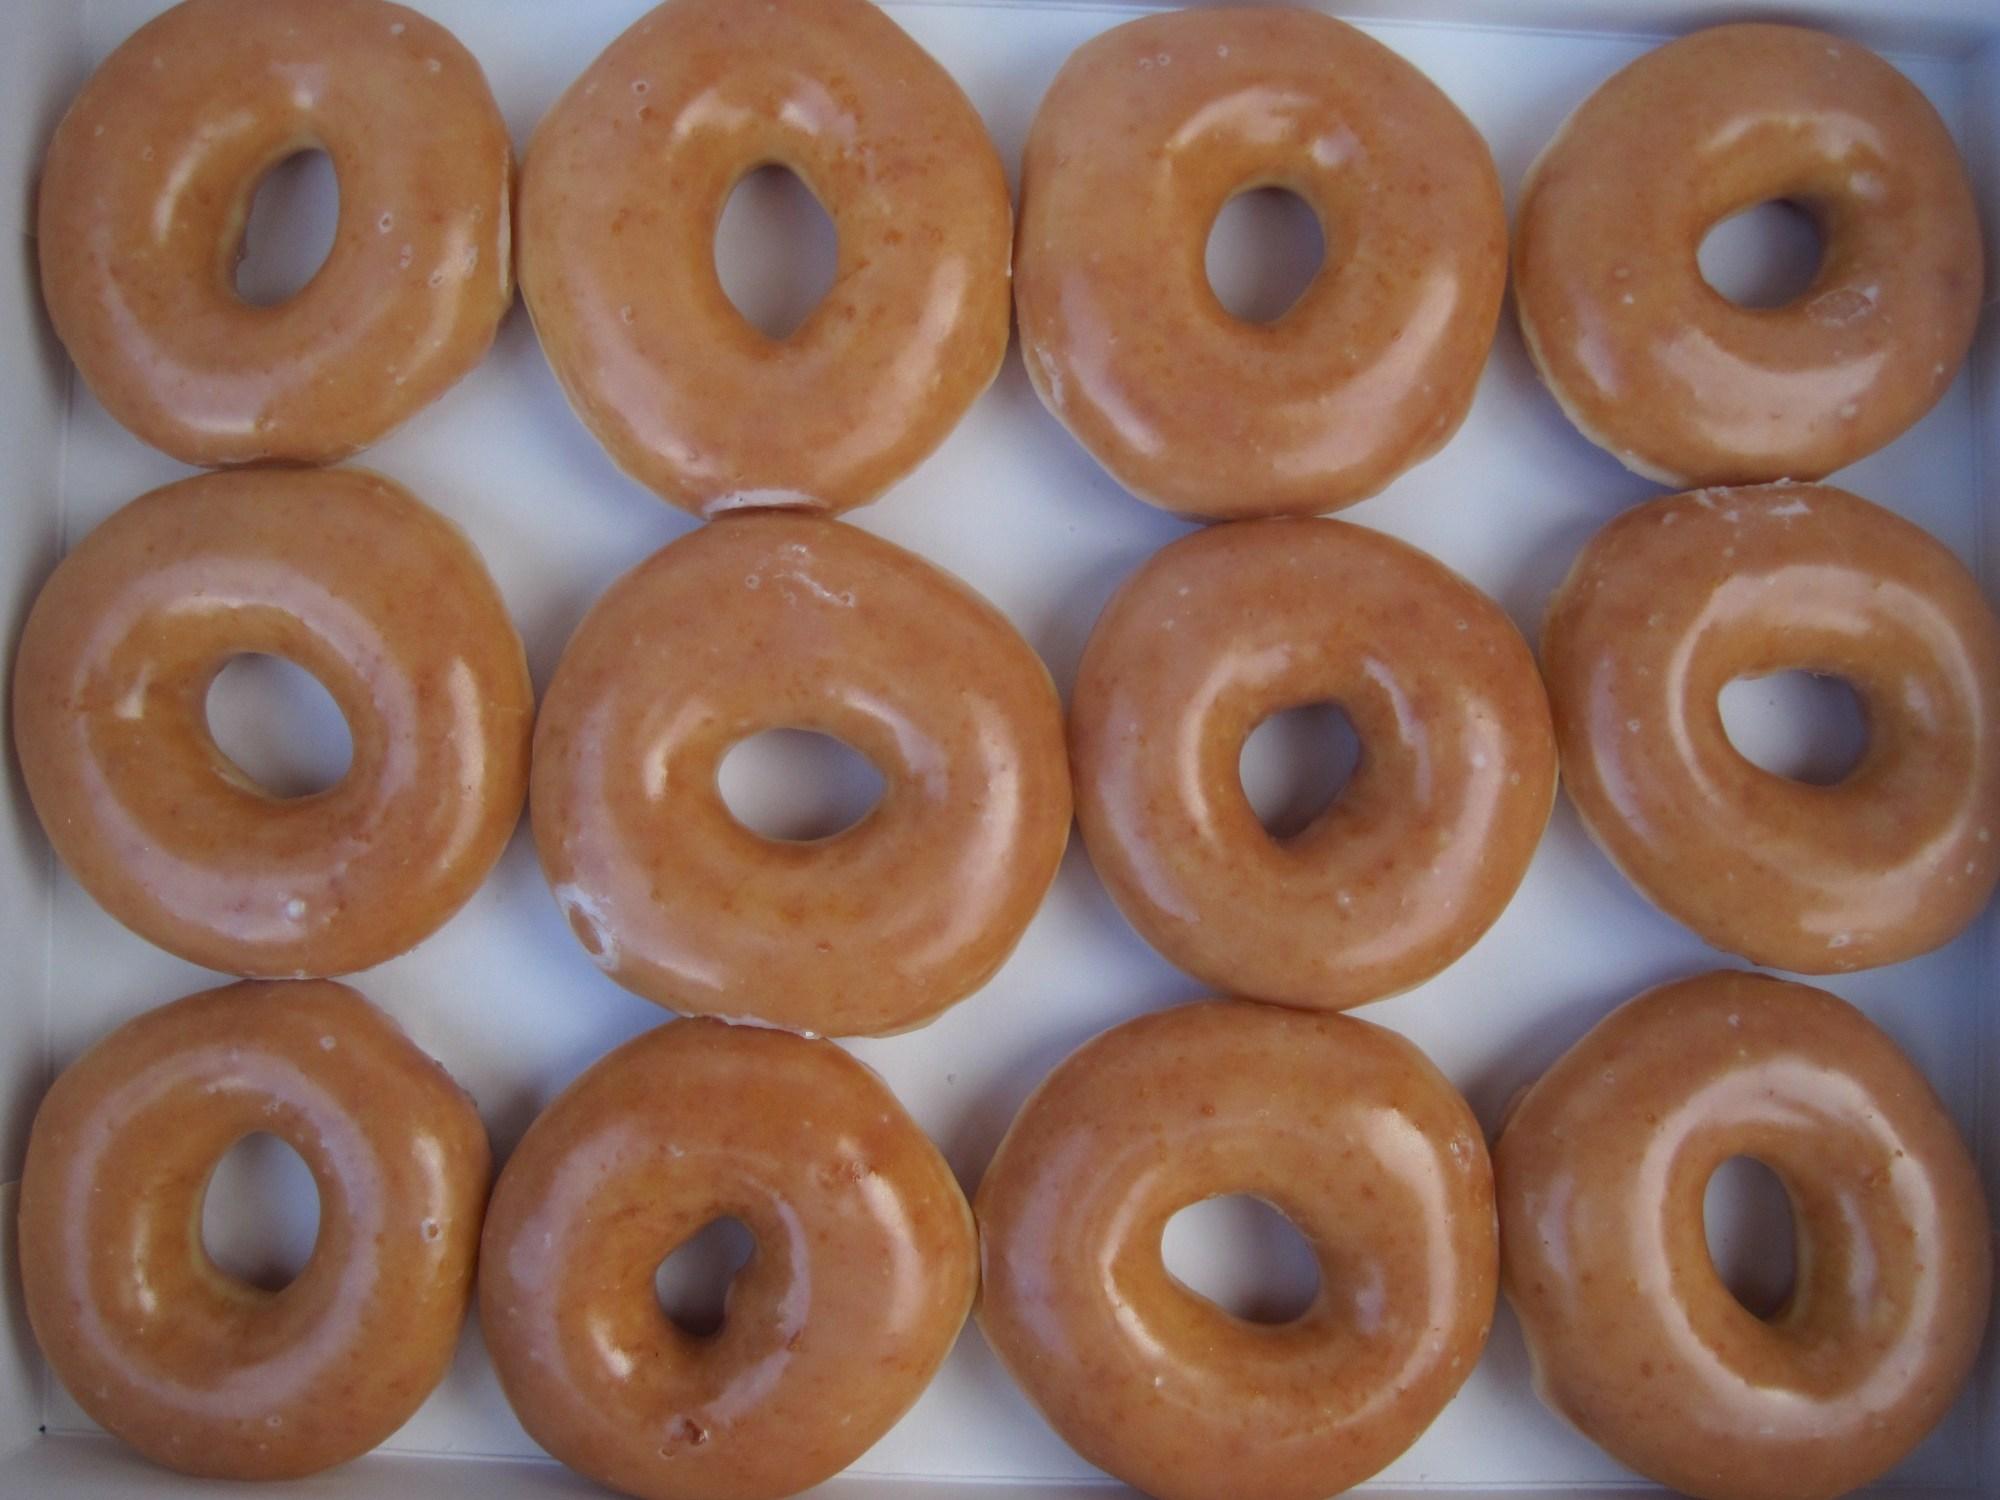 Krispy_Kreme_glazed_donuts_2_1502852977417.JPG